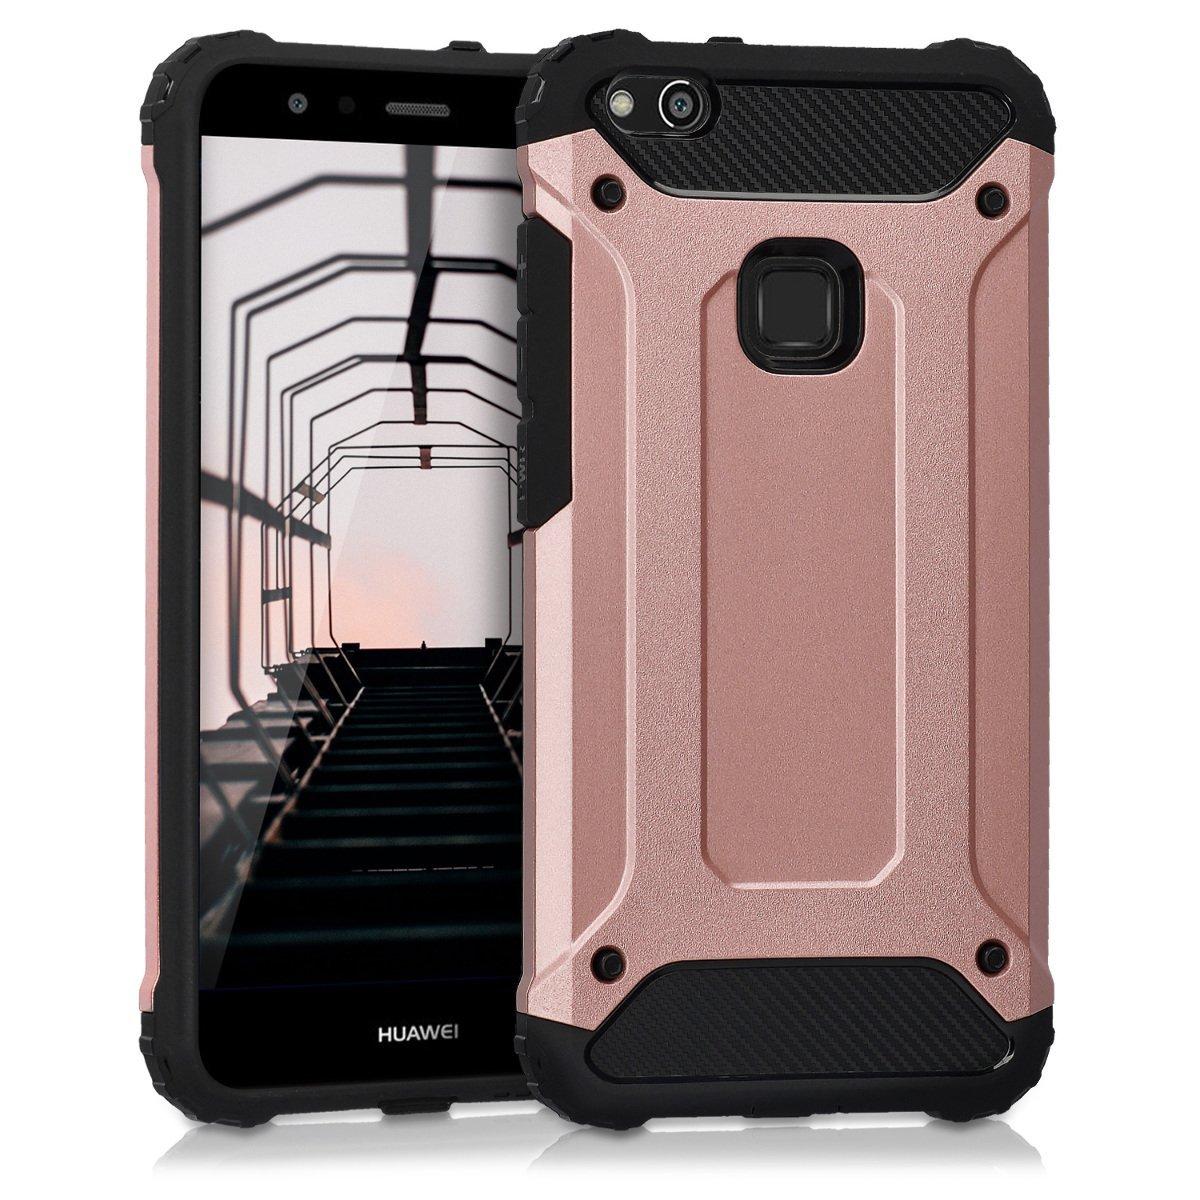 KW Hybrid Θήκη Transformer Design Huawei P10 Lite - Rose Gold/Black (41382.02)